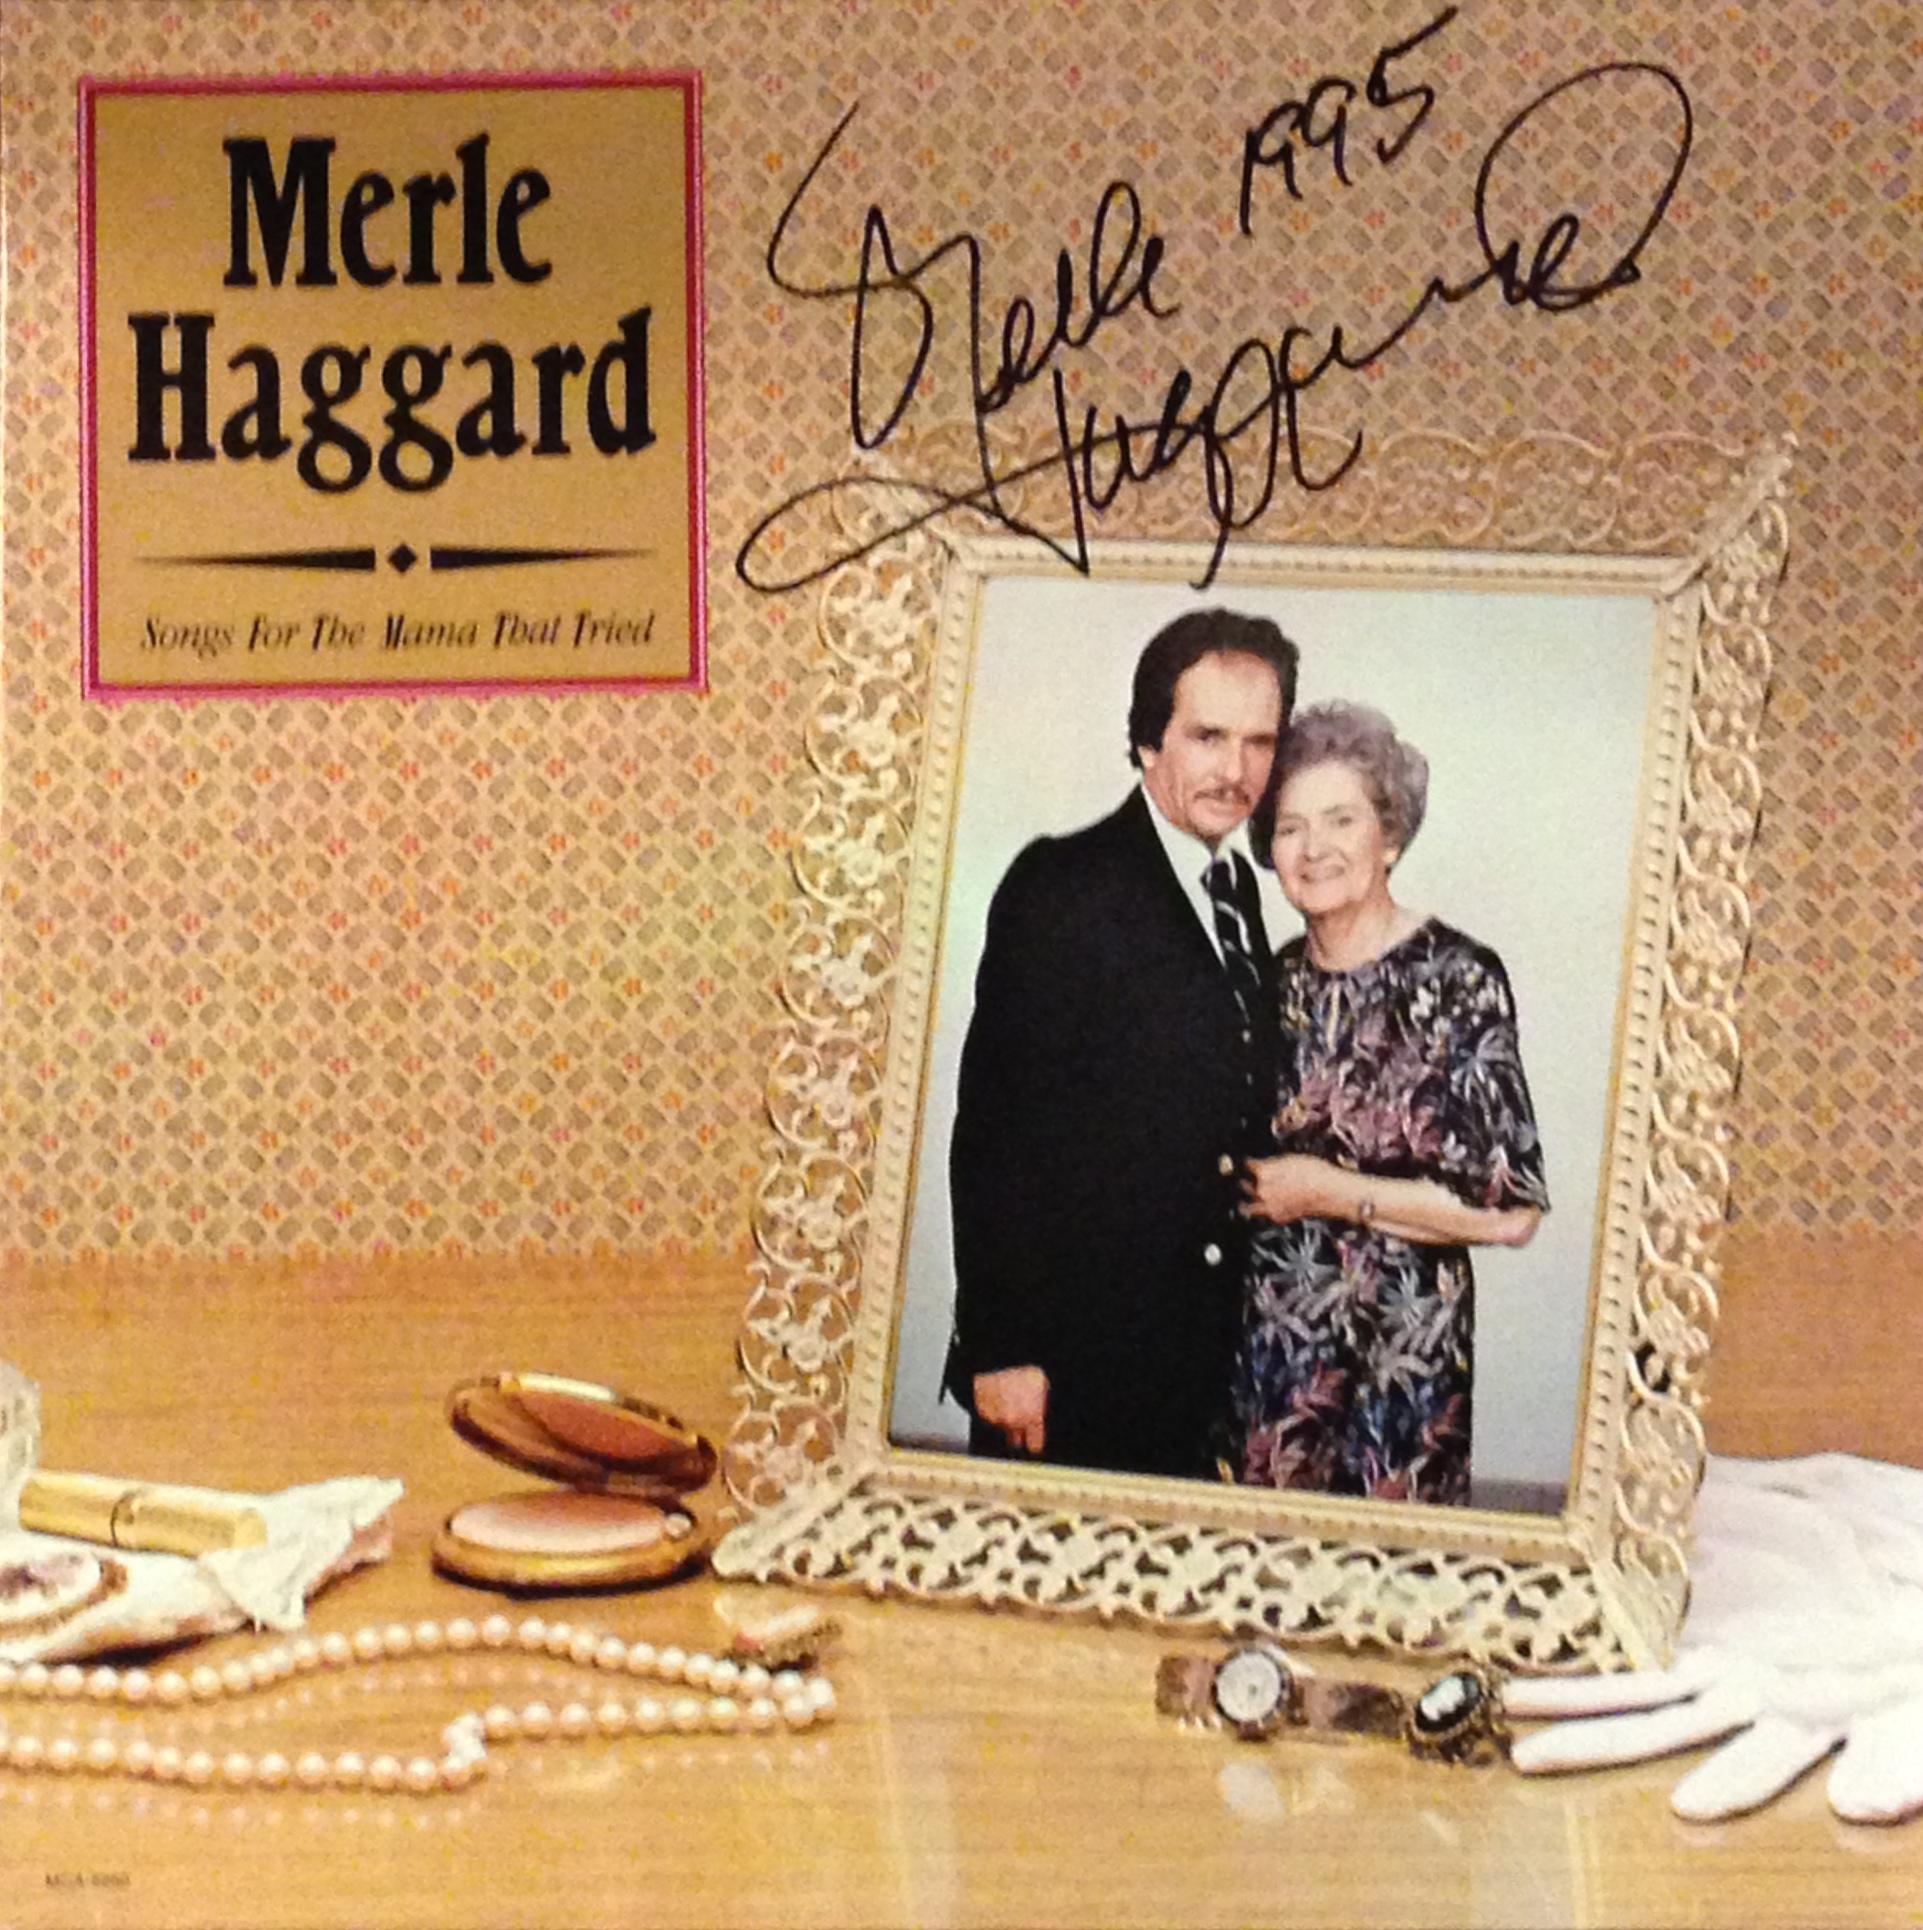 Merle Haggard And Me Huffpost